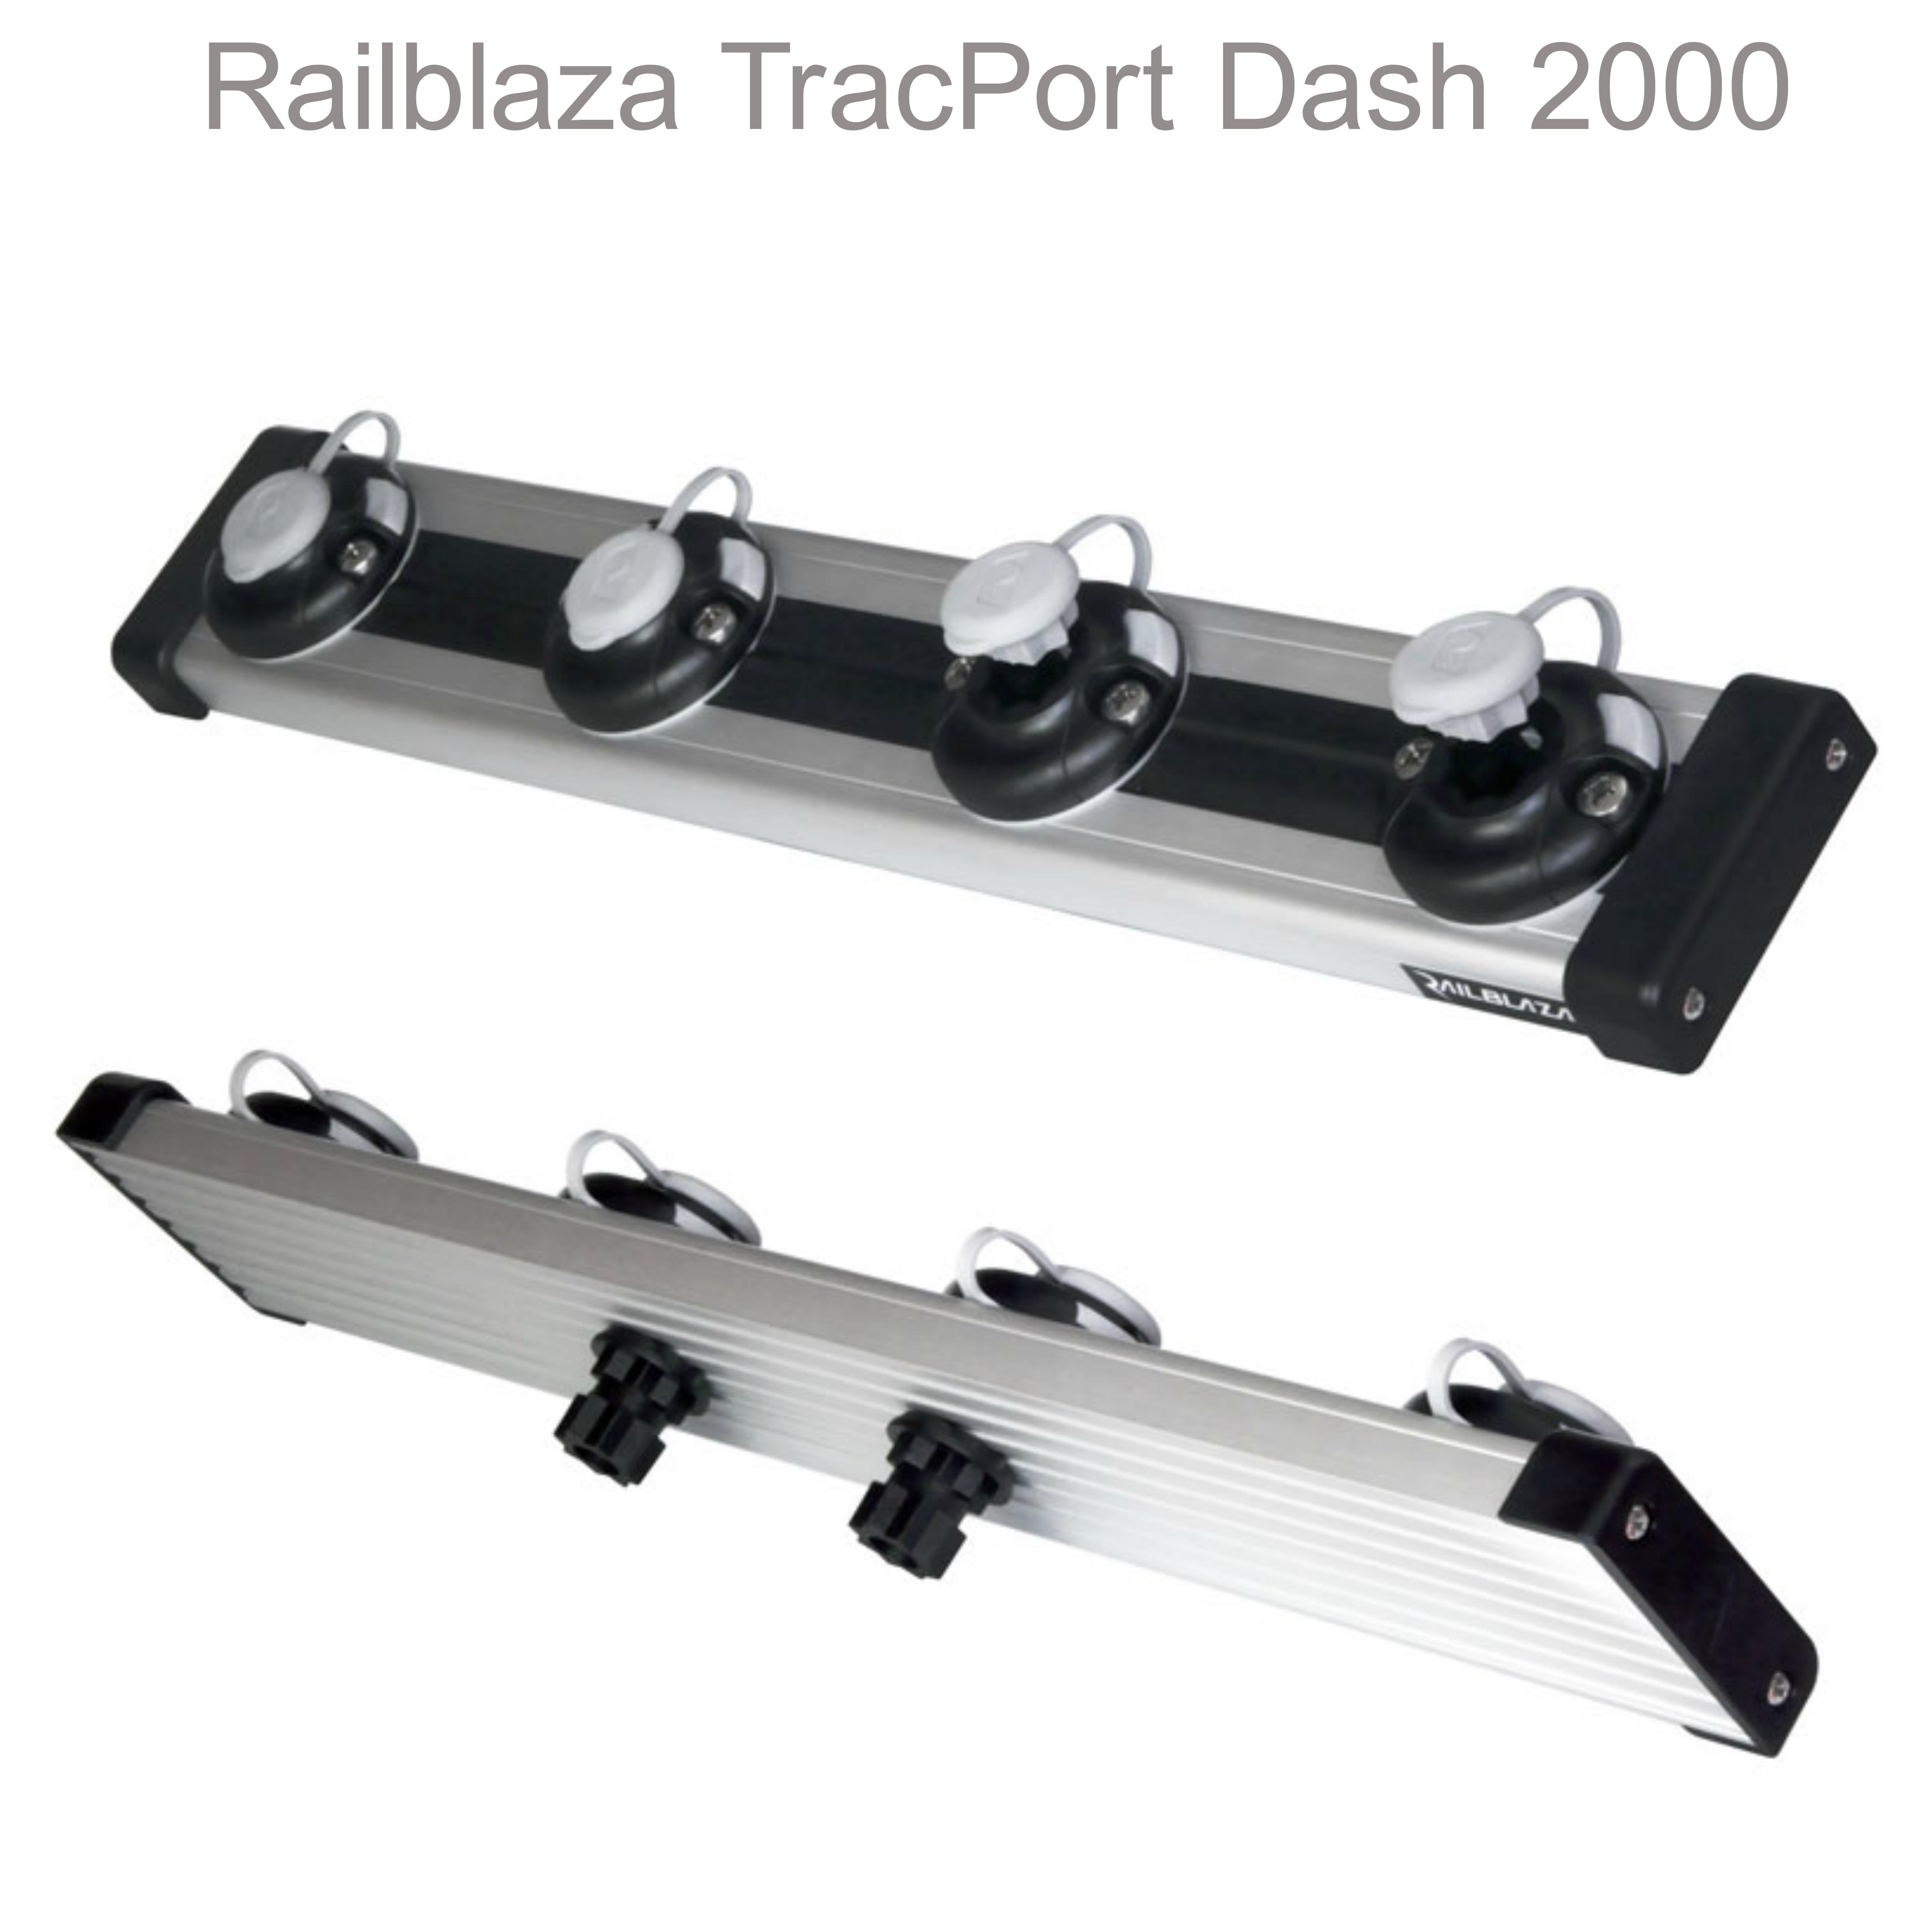 Railblaza-03410711|TracPort Dash|2000 mm|4 StarPort|For Mounting|kayak & Boats